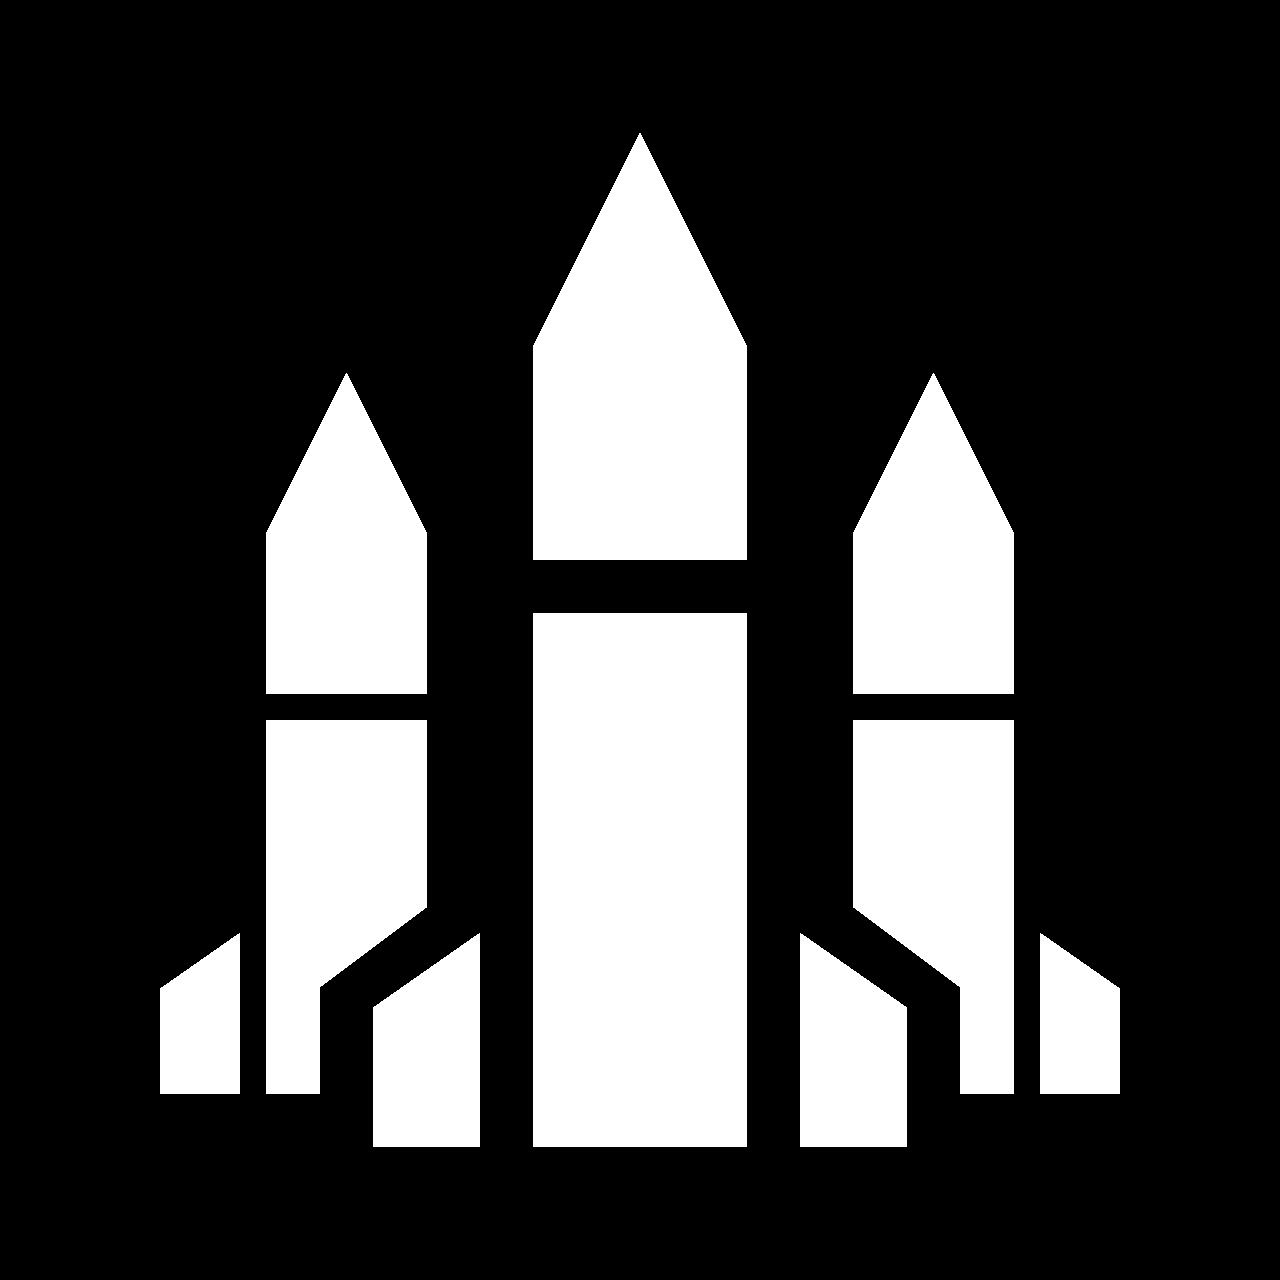 Курсовая ракета Иконка